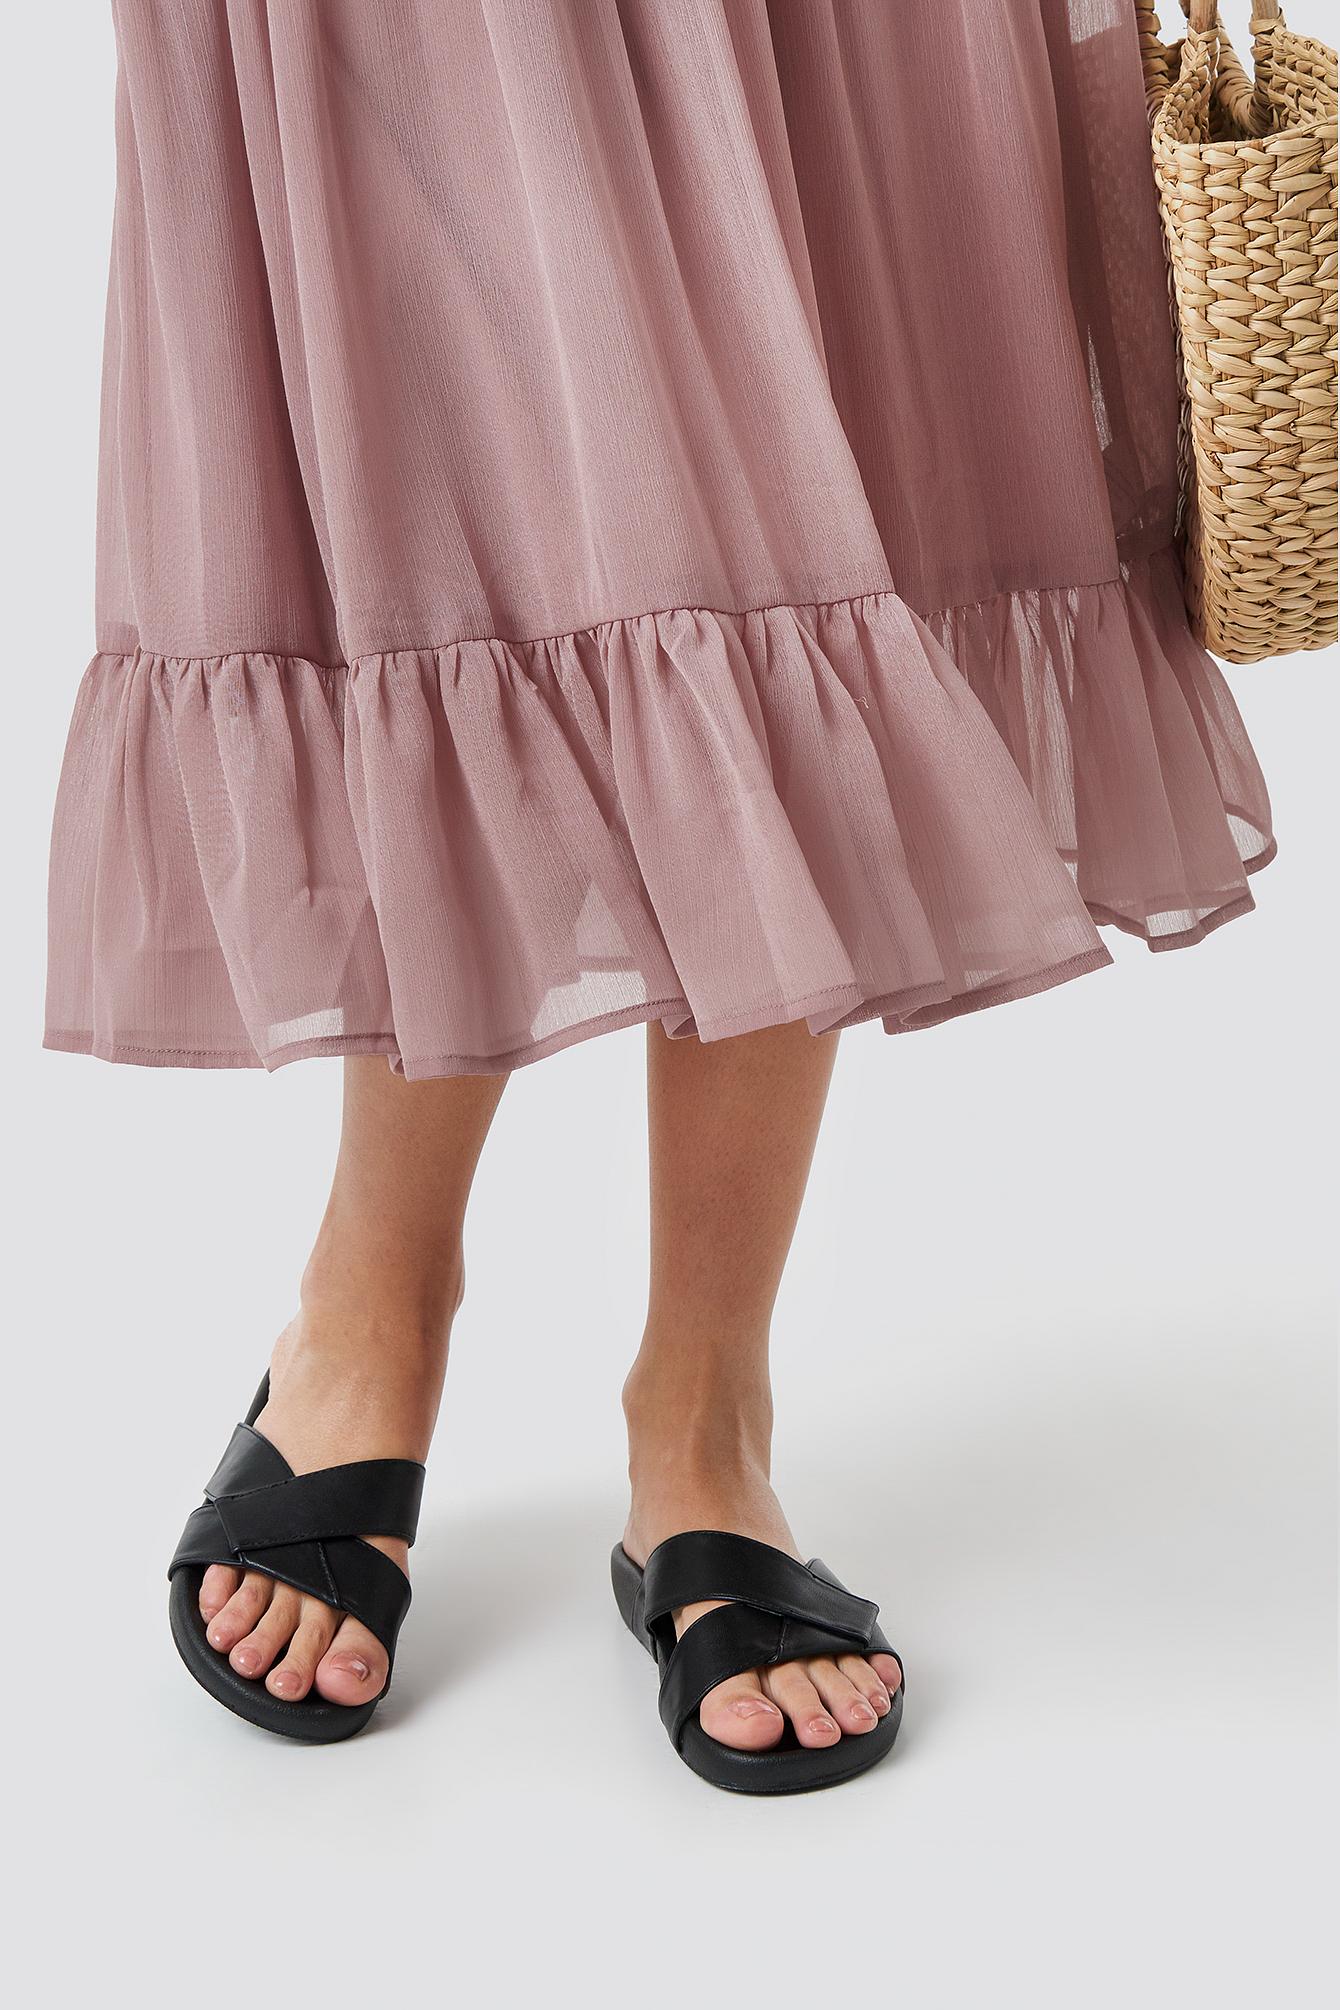 Knotted PU Slippers NA-KD.COM